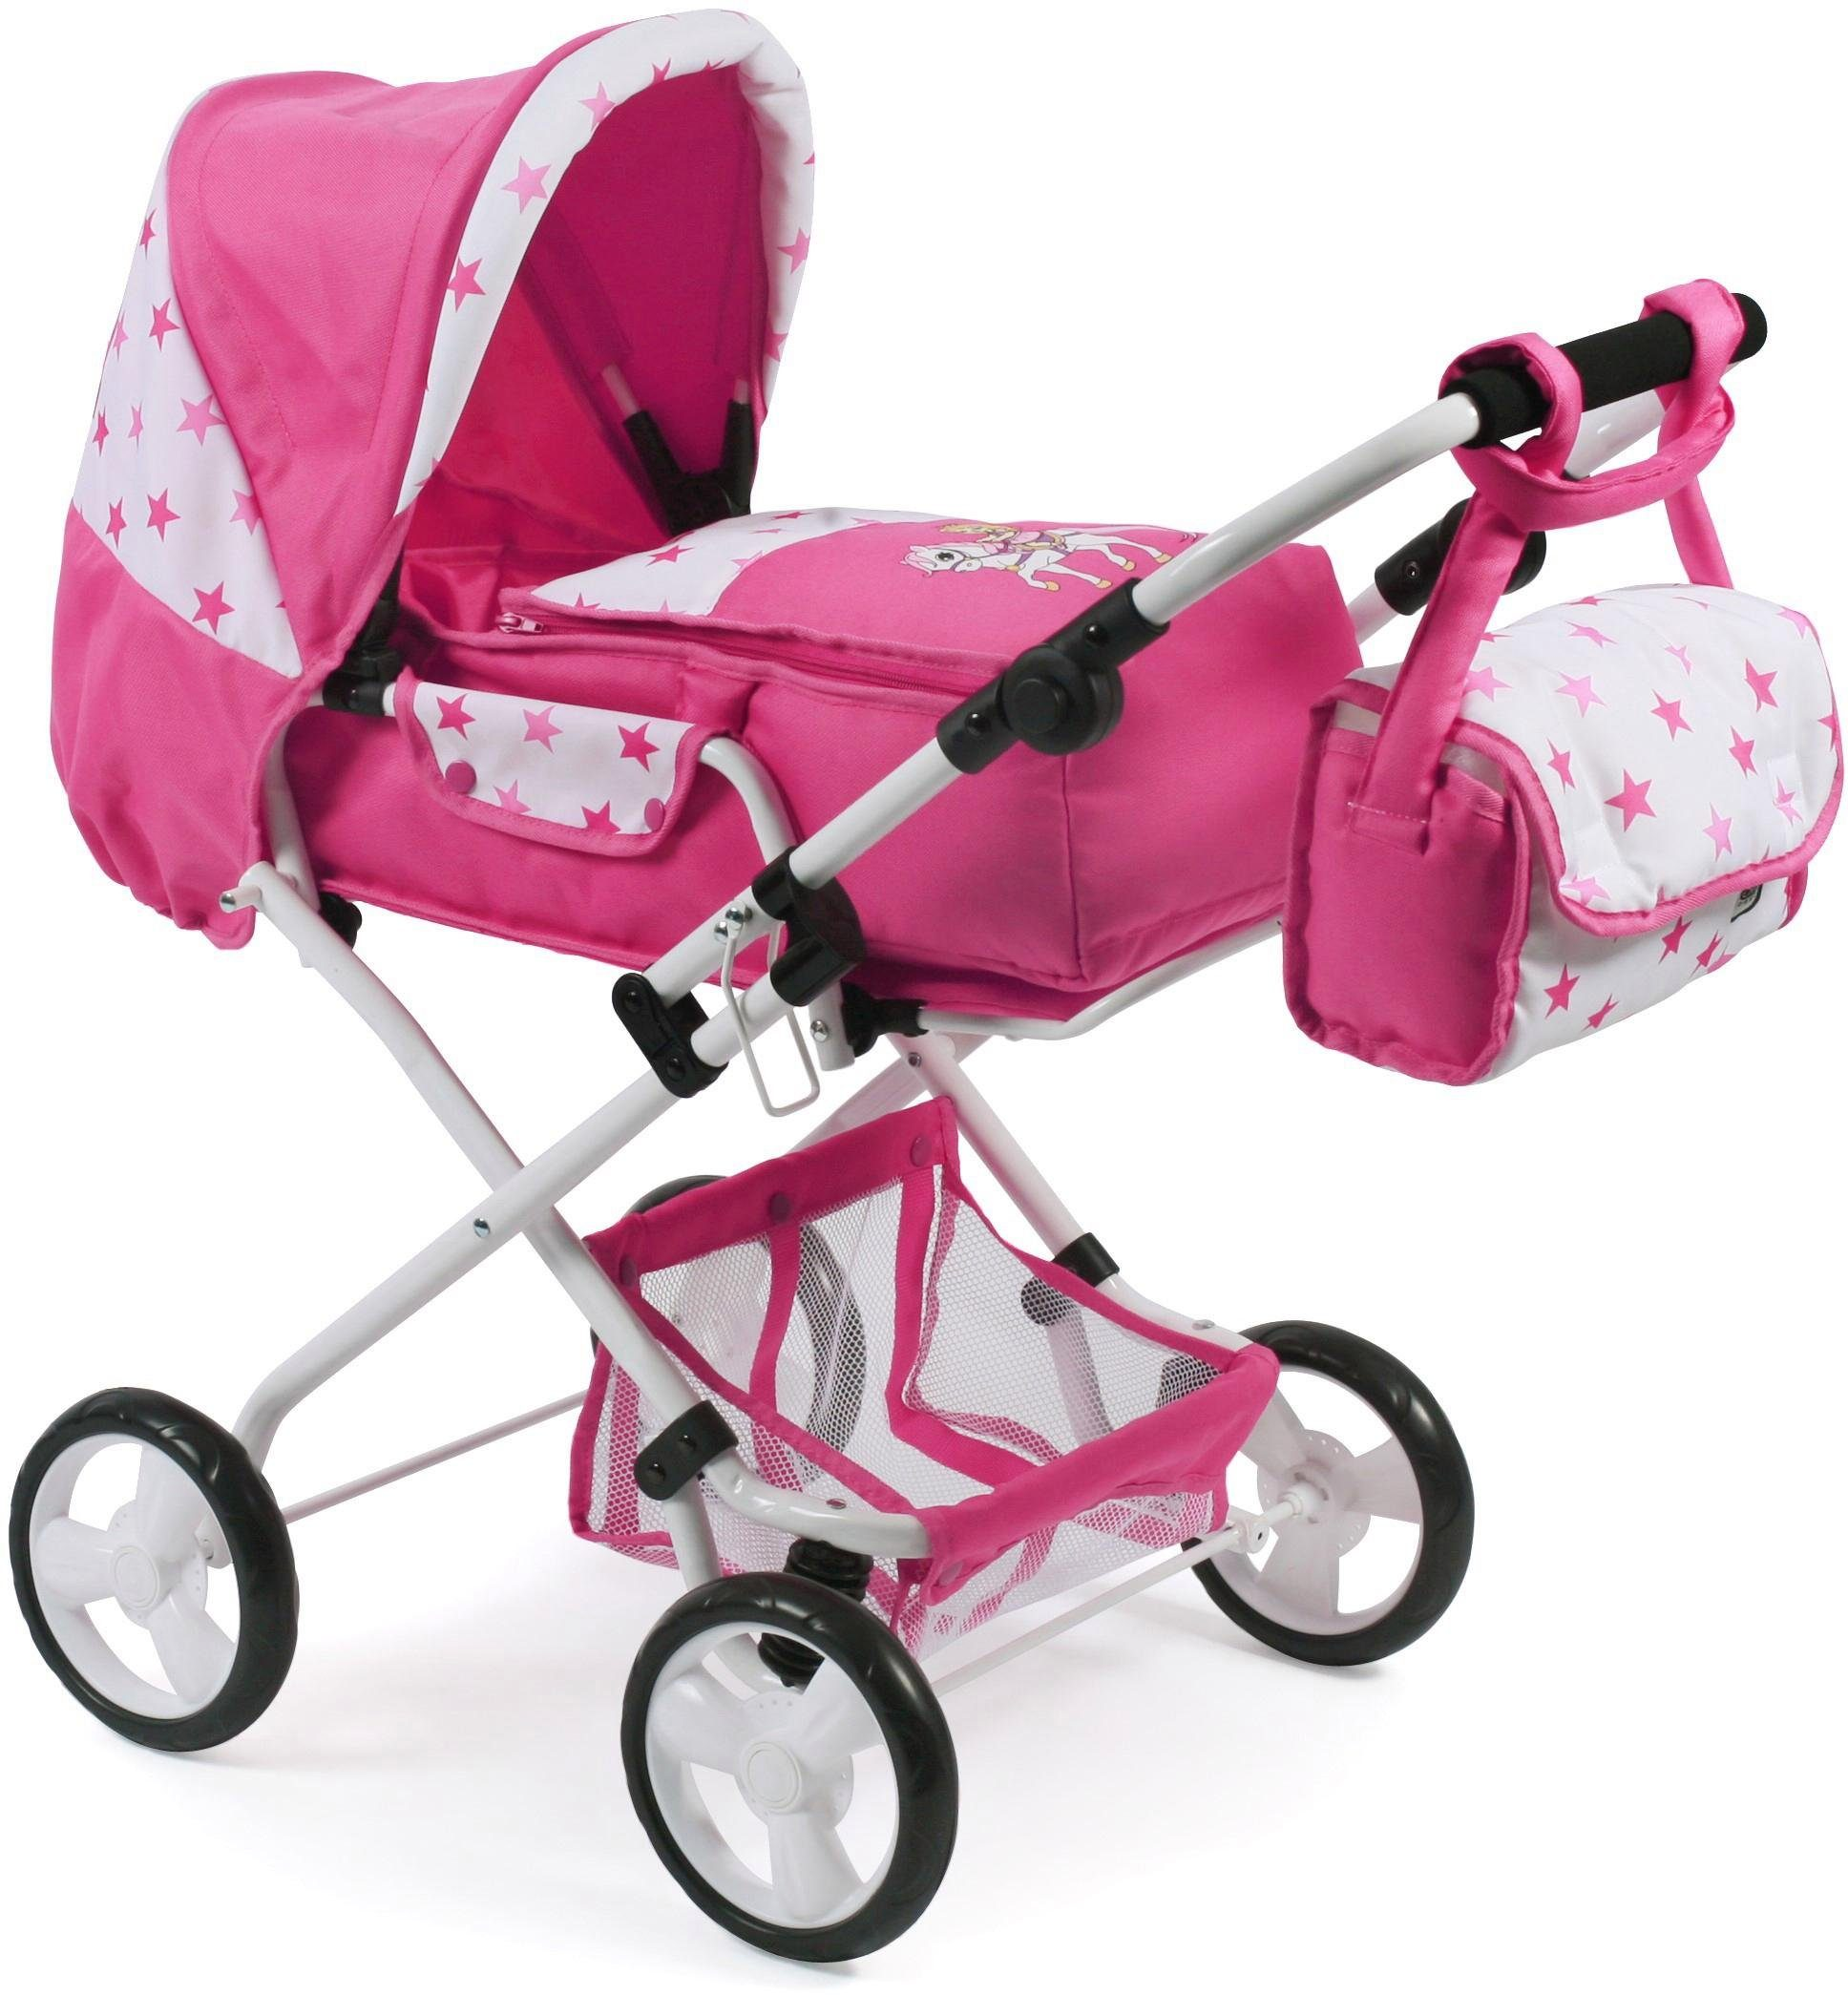 CHIC2000 Kombi Puppenwagen mit herausnehmbarer Tragetasche, »Bambina, Princess«